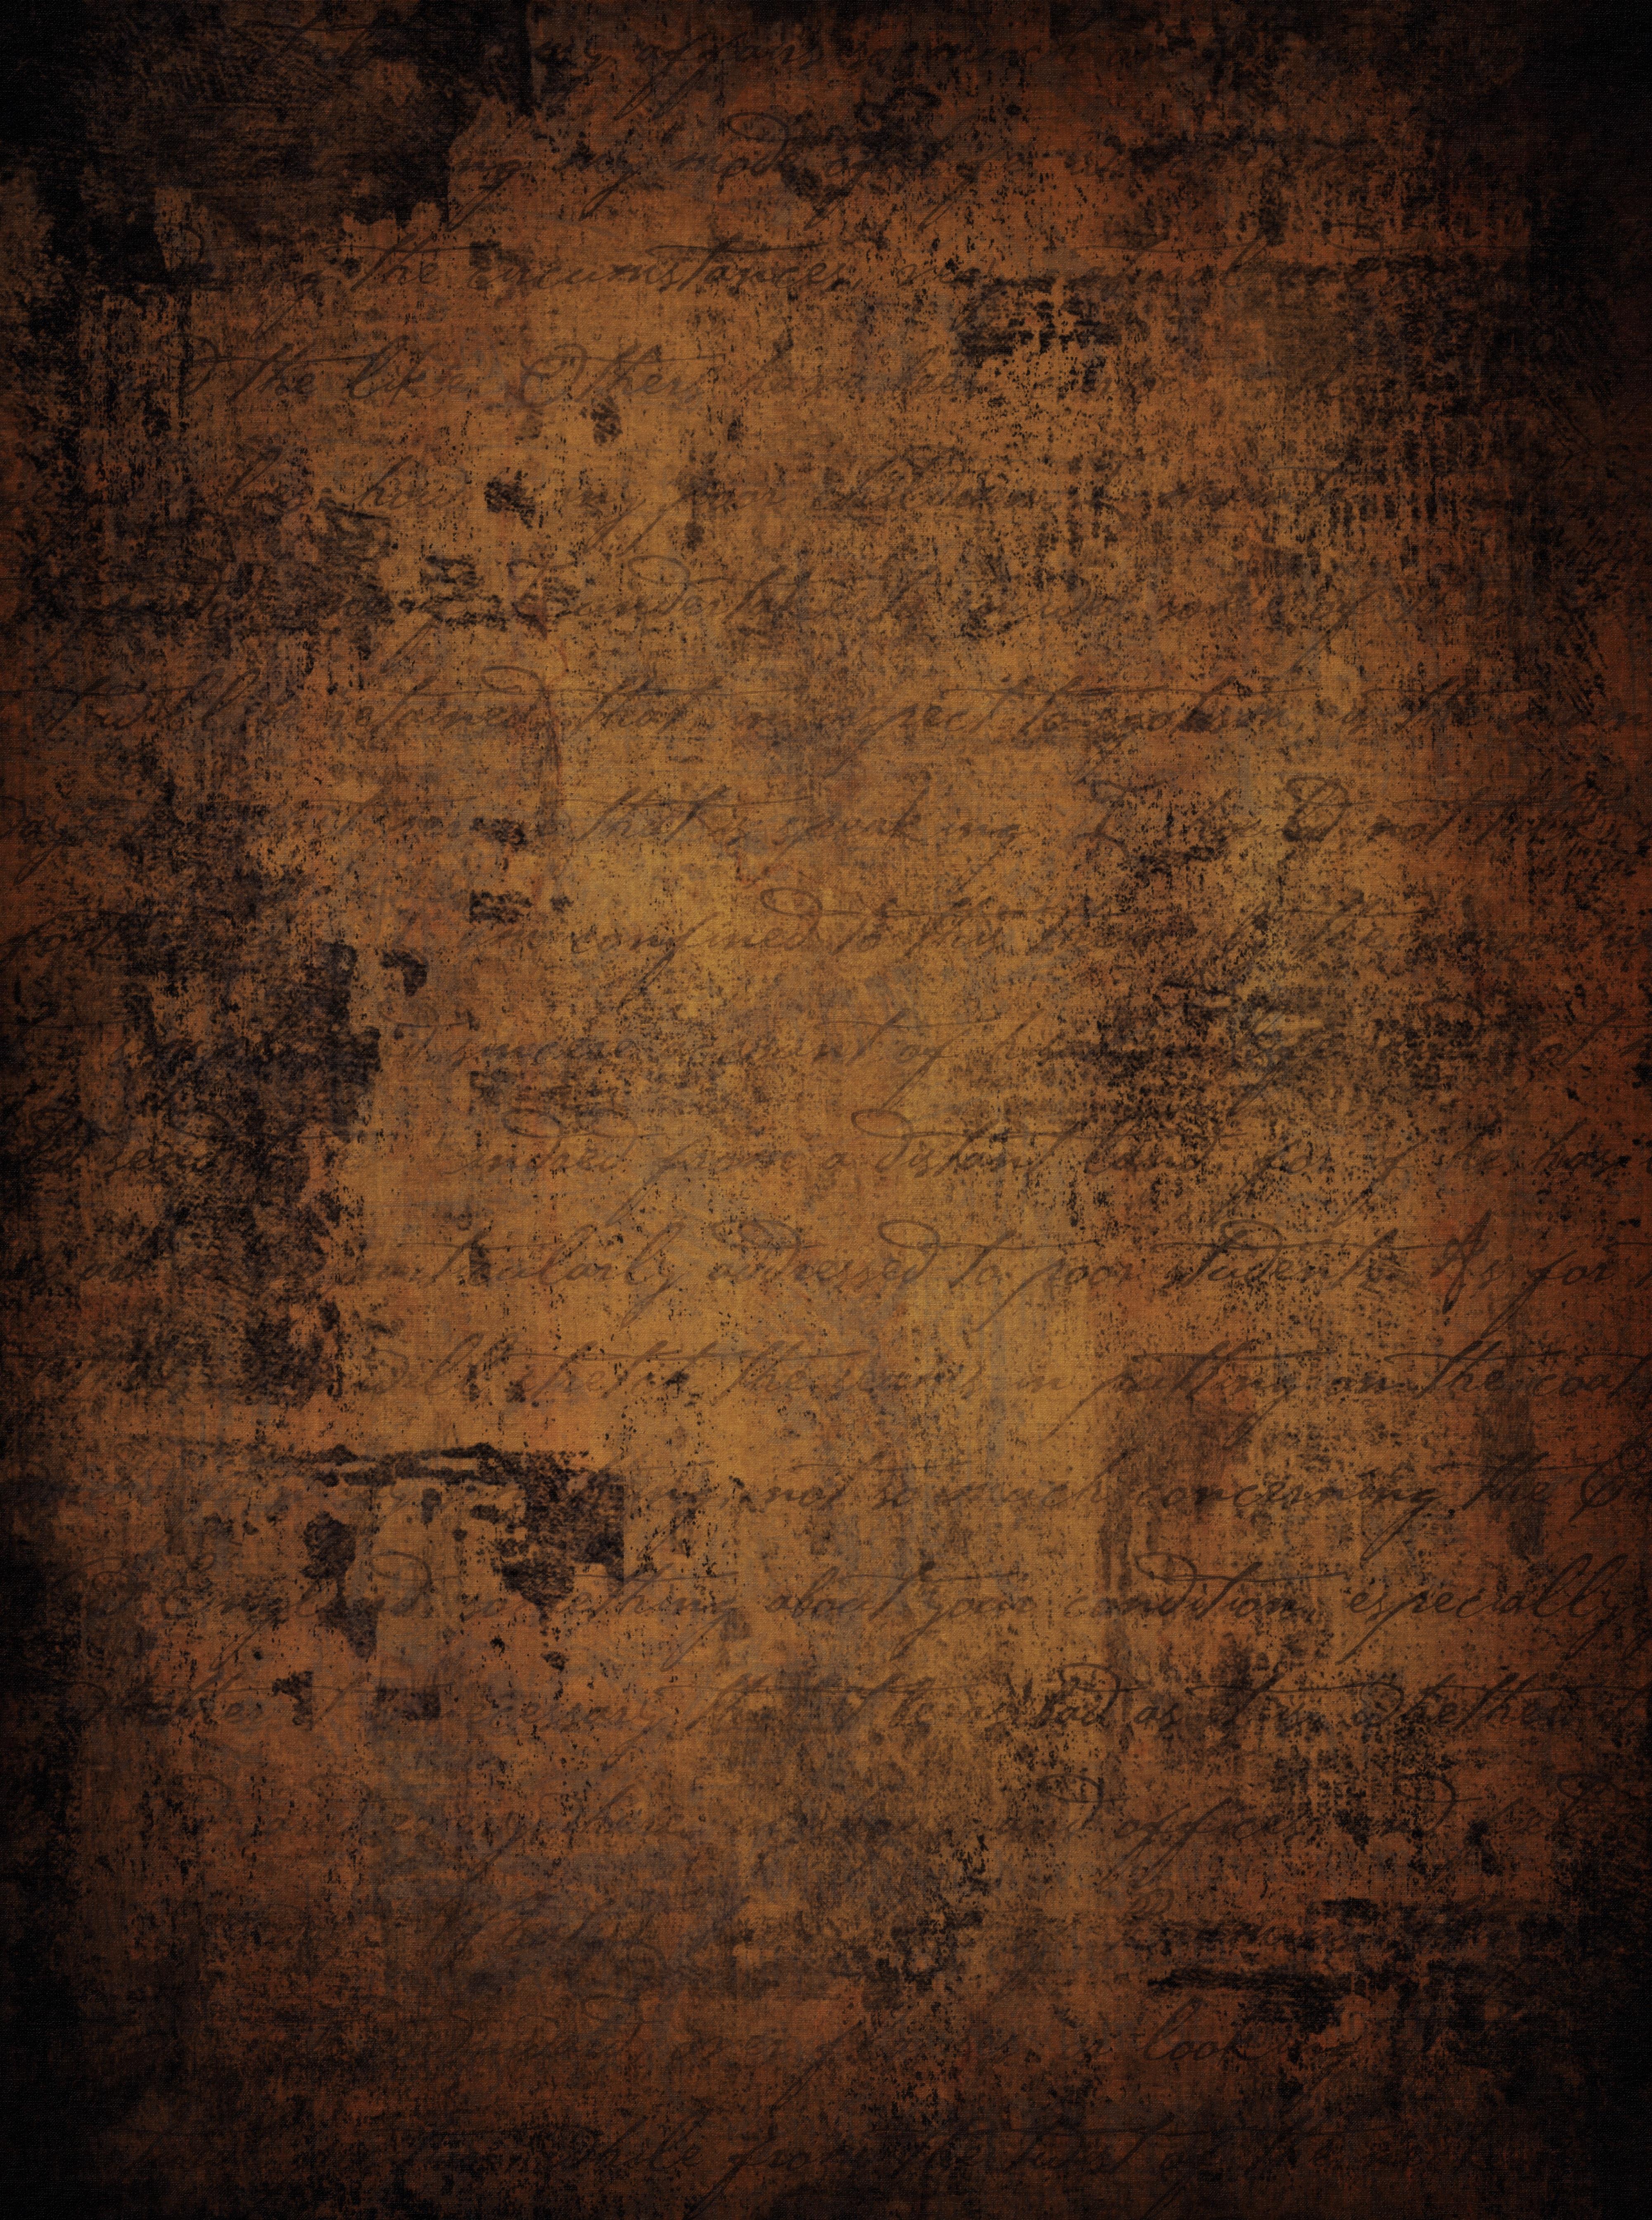 Vintage texture canvas free image